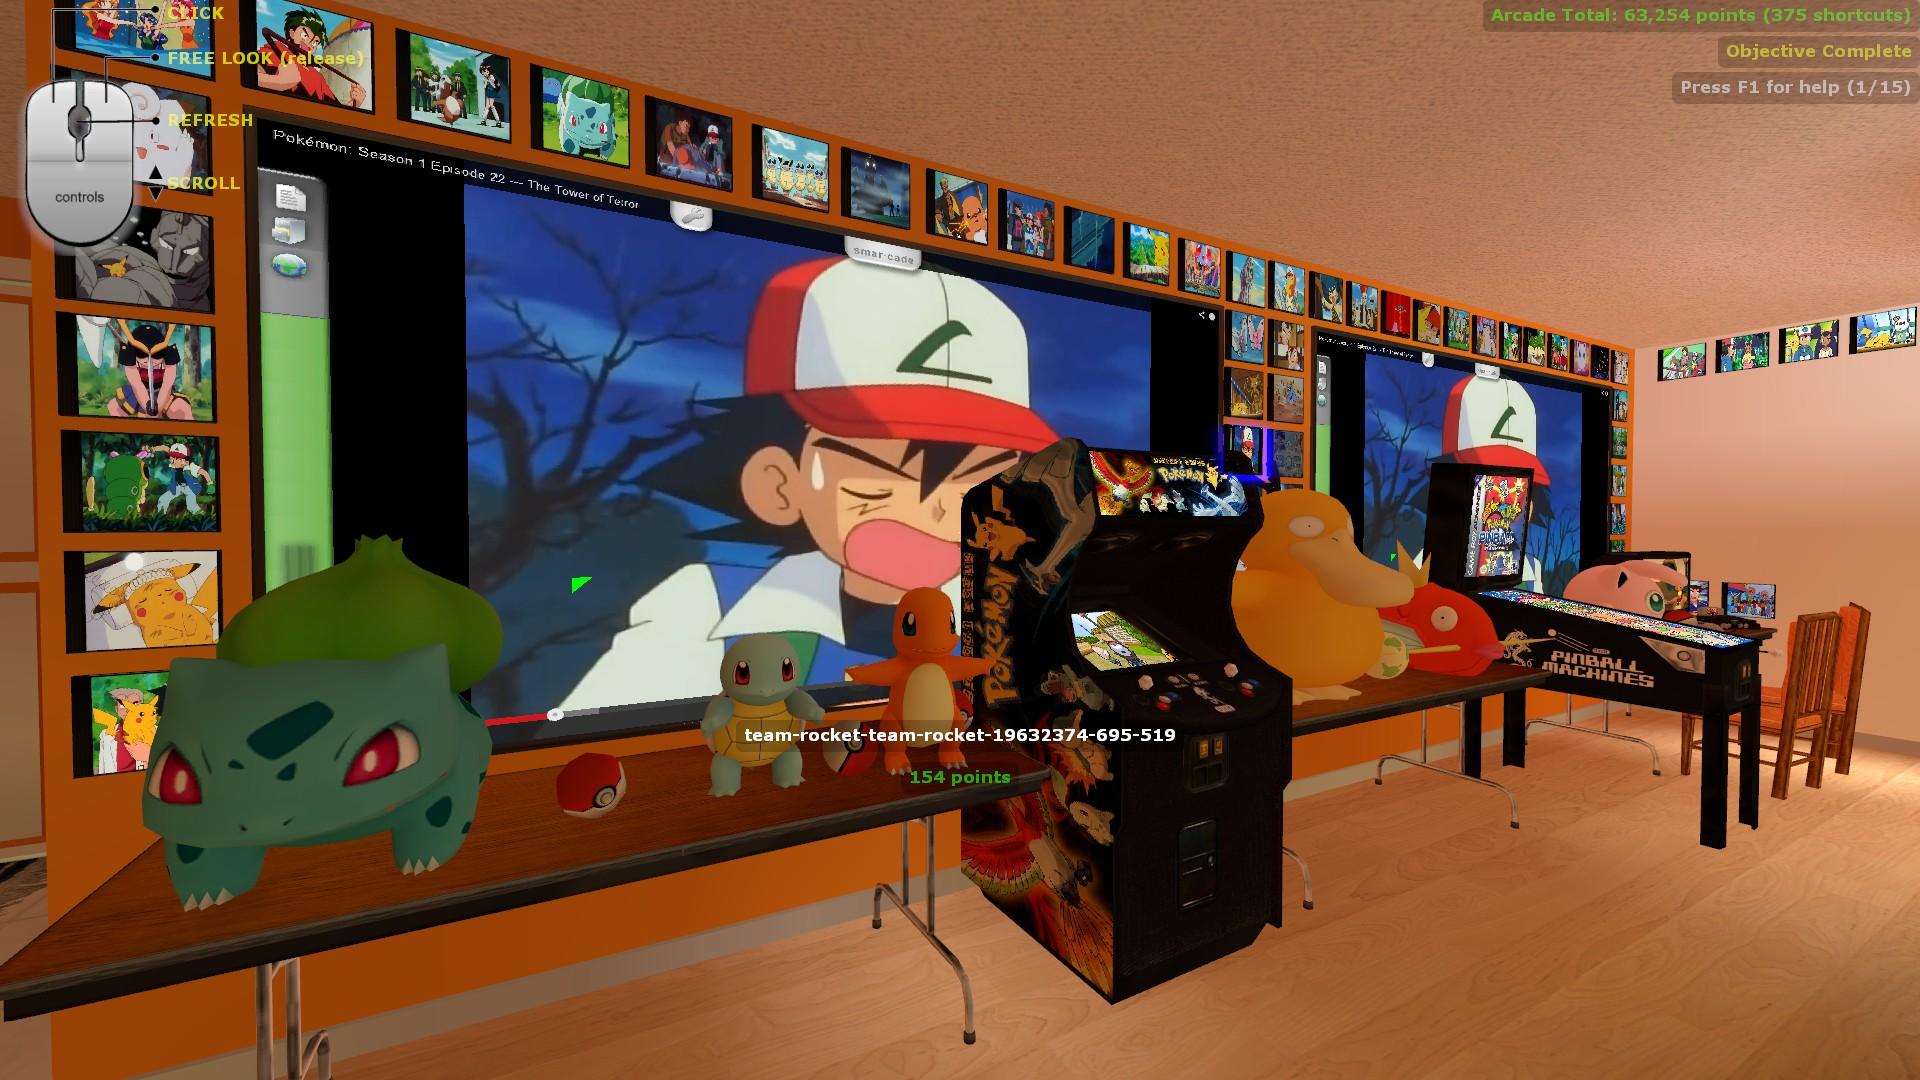 Anarchy arcade: A source game